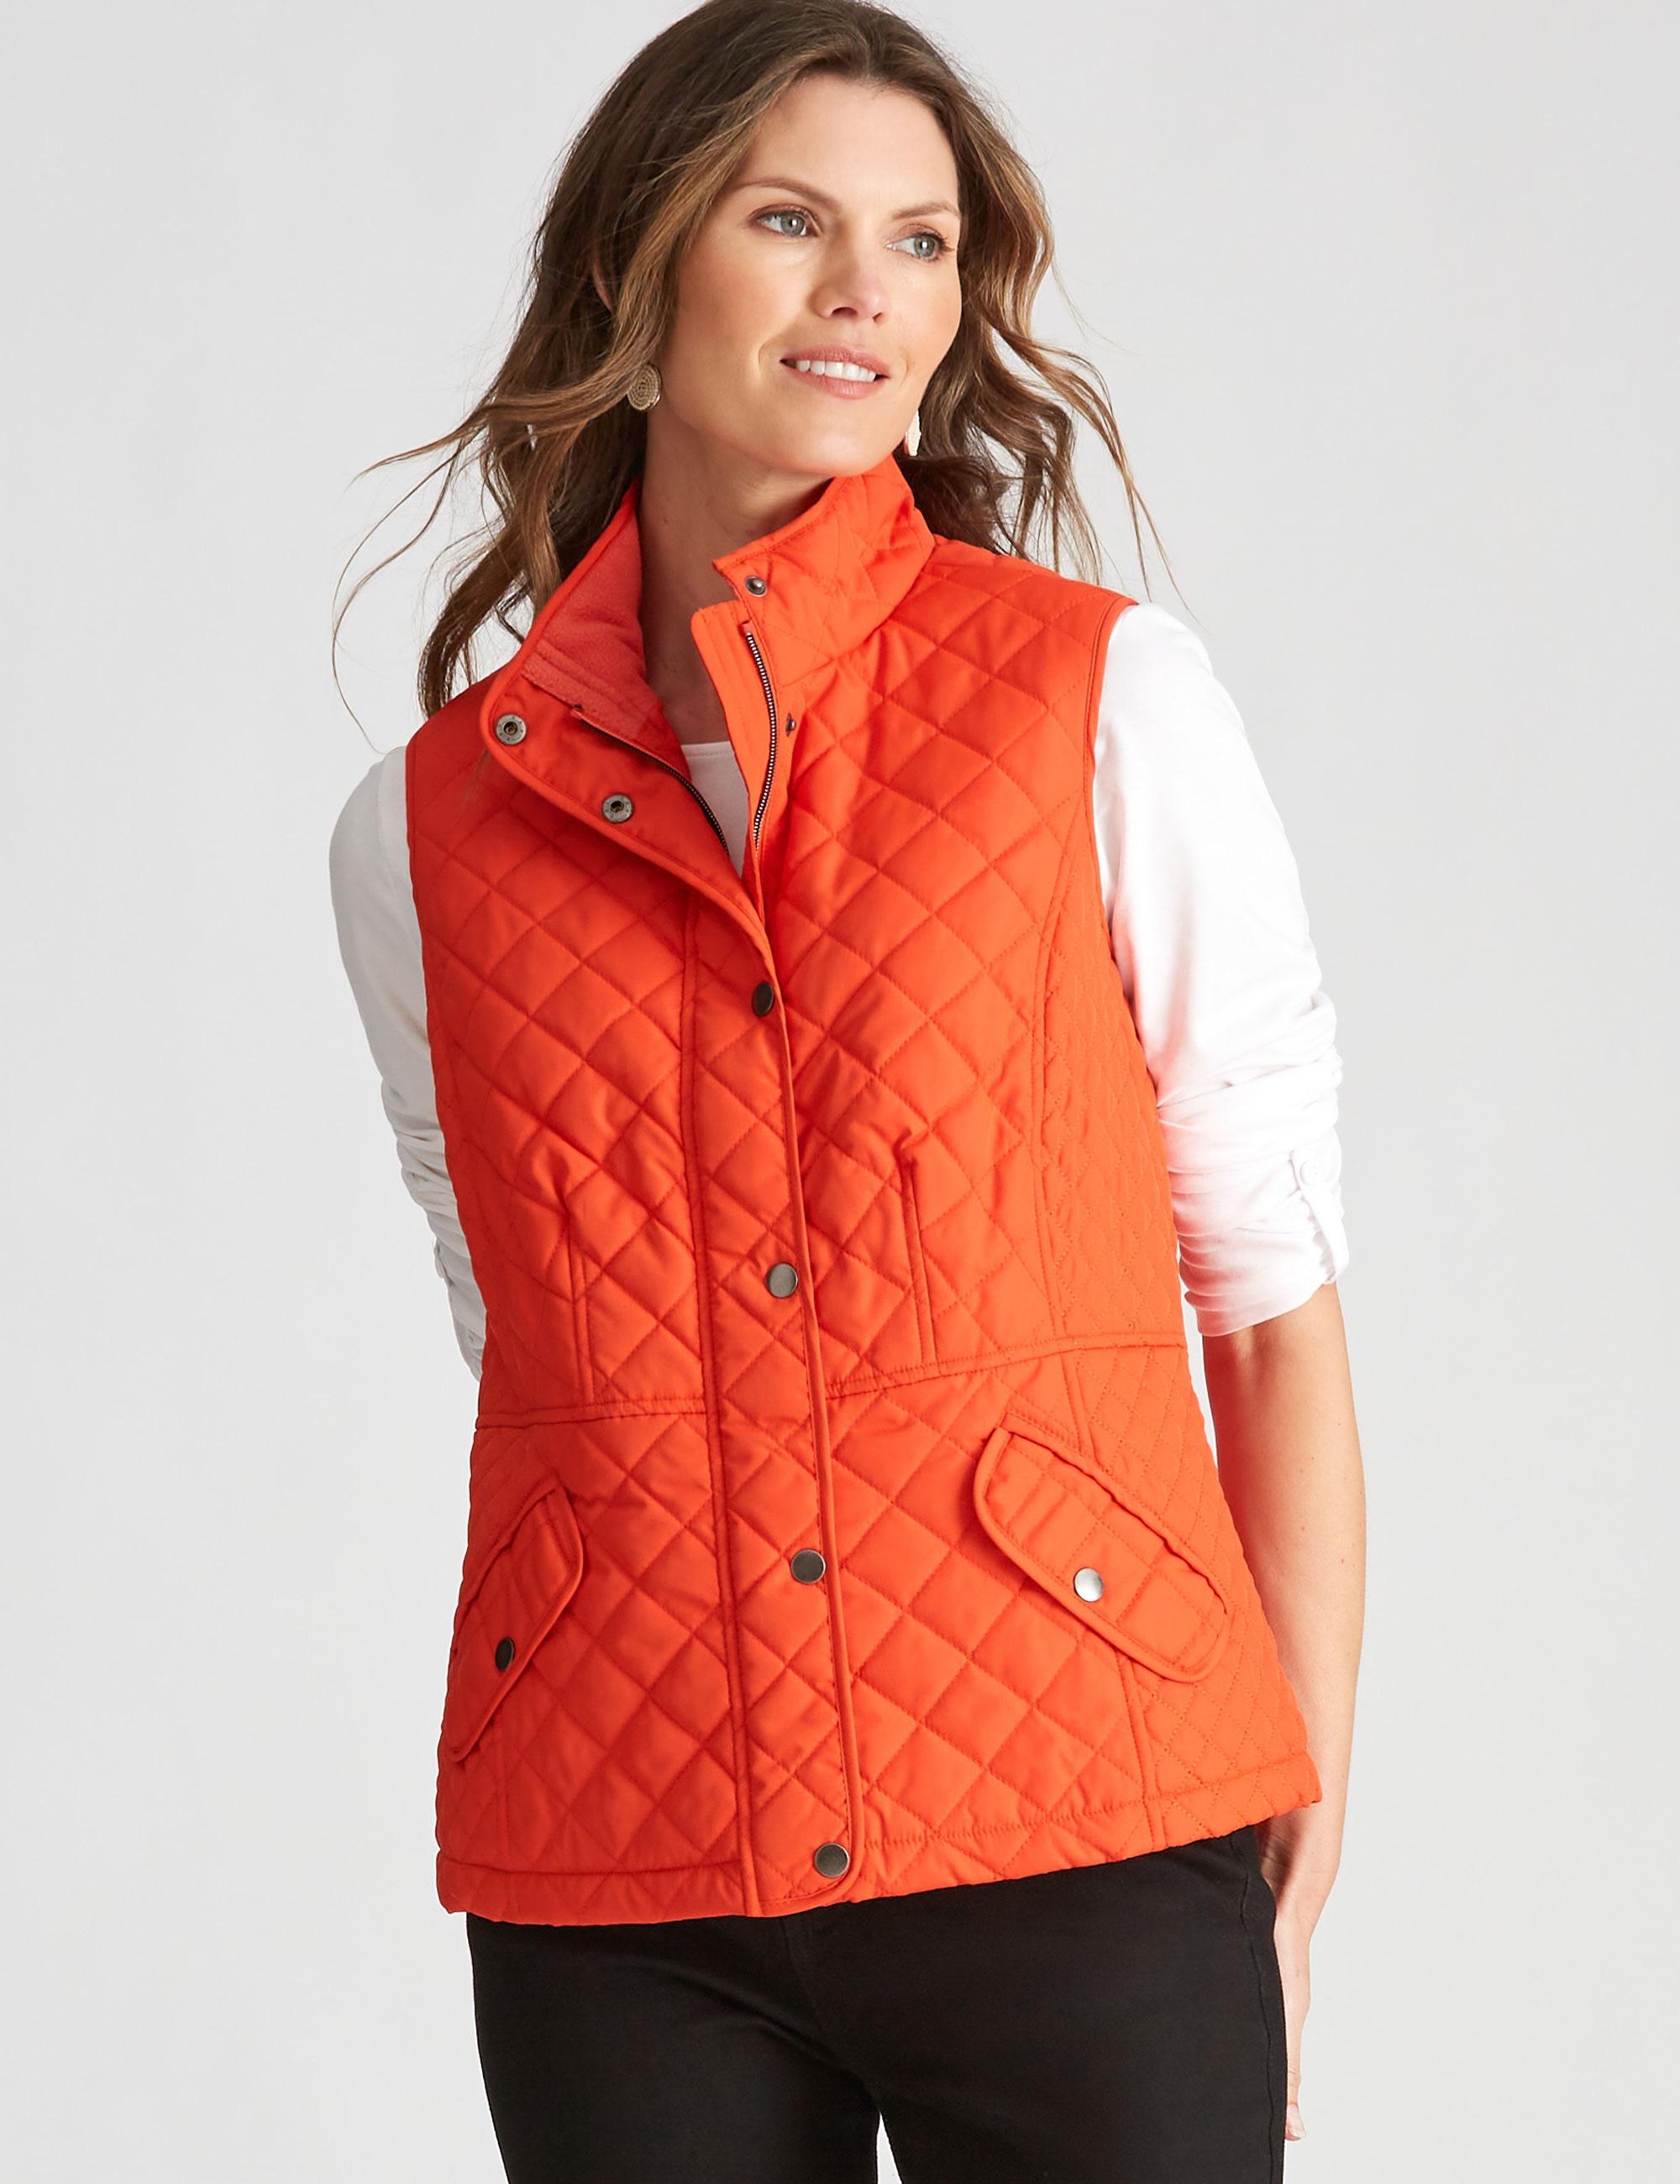 1052468901 1 - Women Fashion